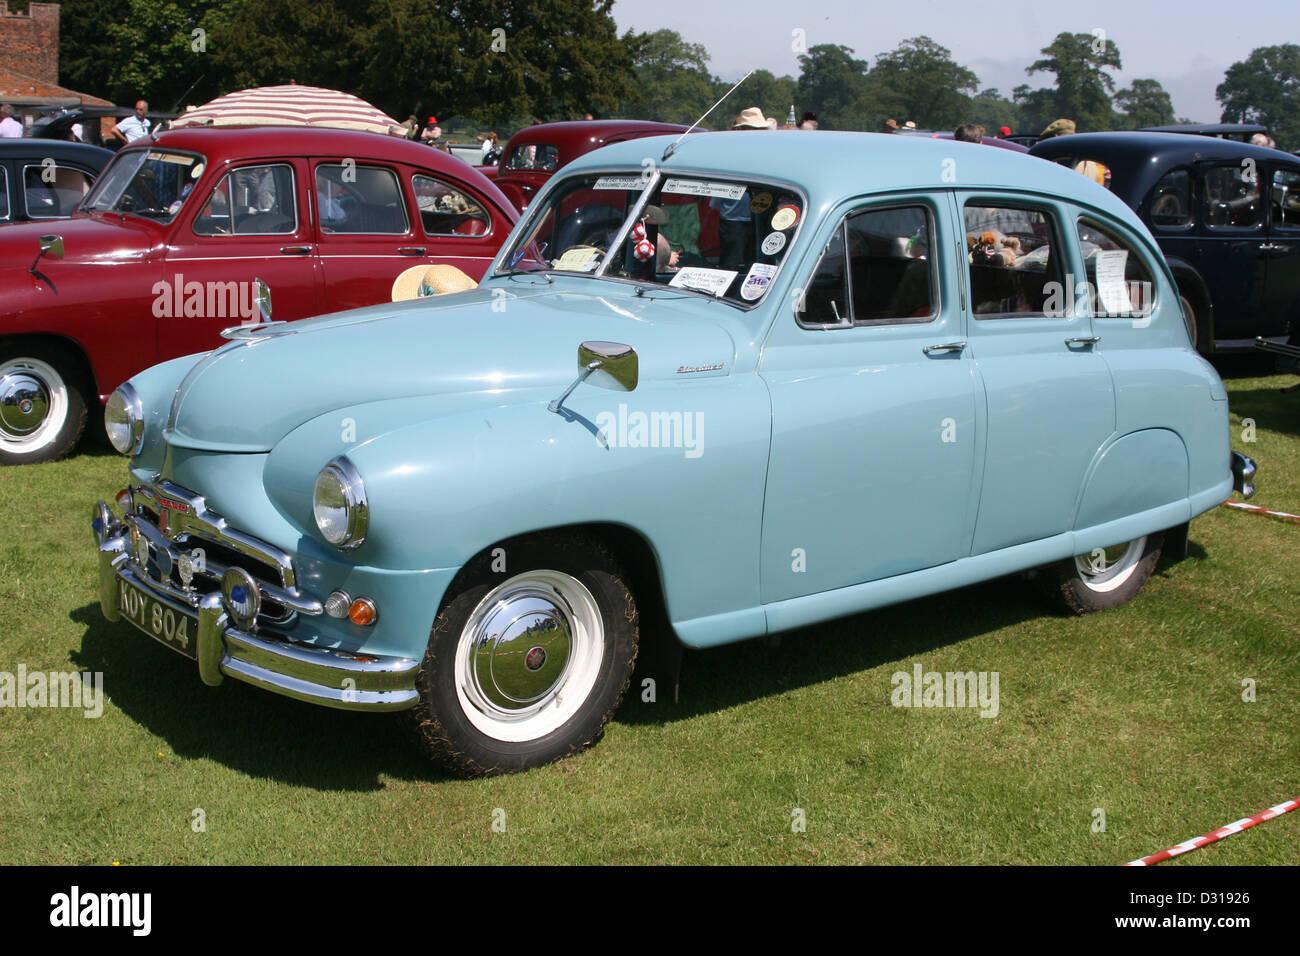 Vanguard Motor Car Stock Photo: 53504142 - Alamy